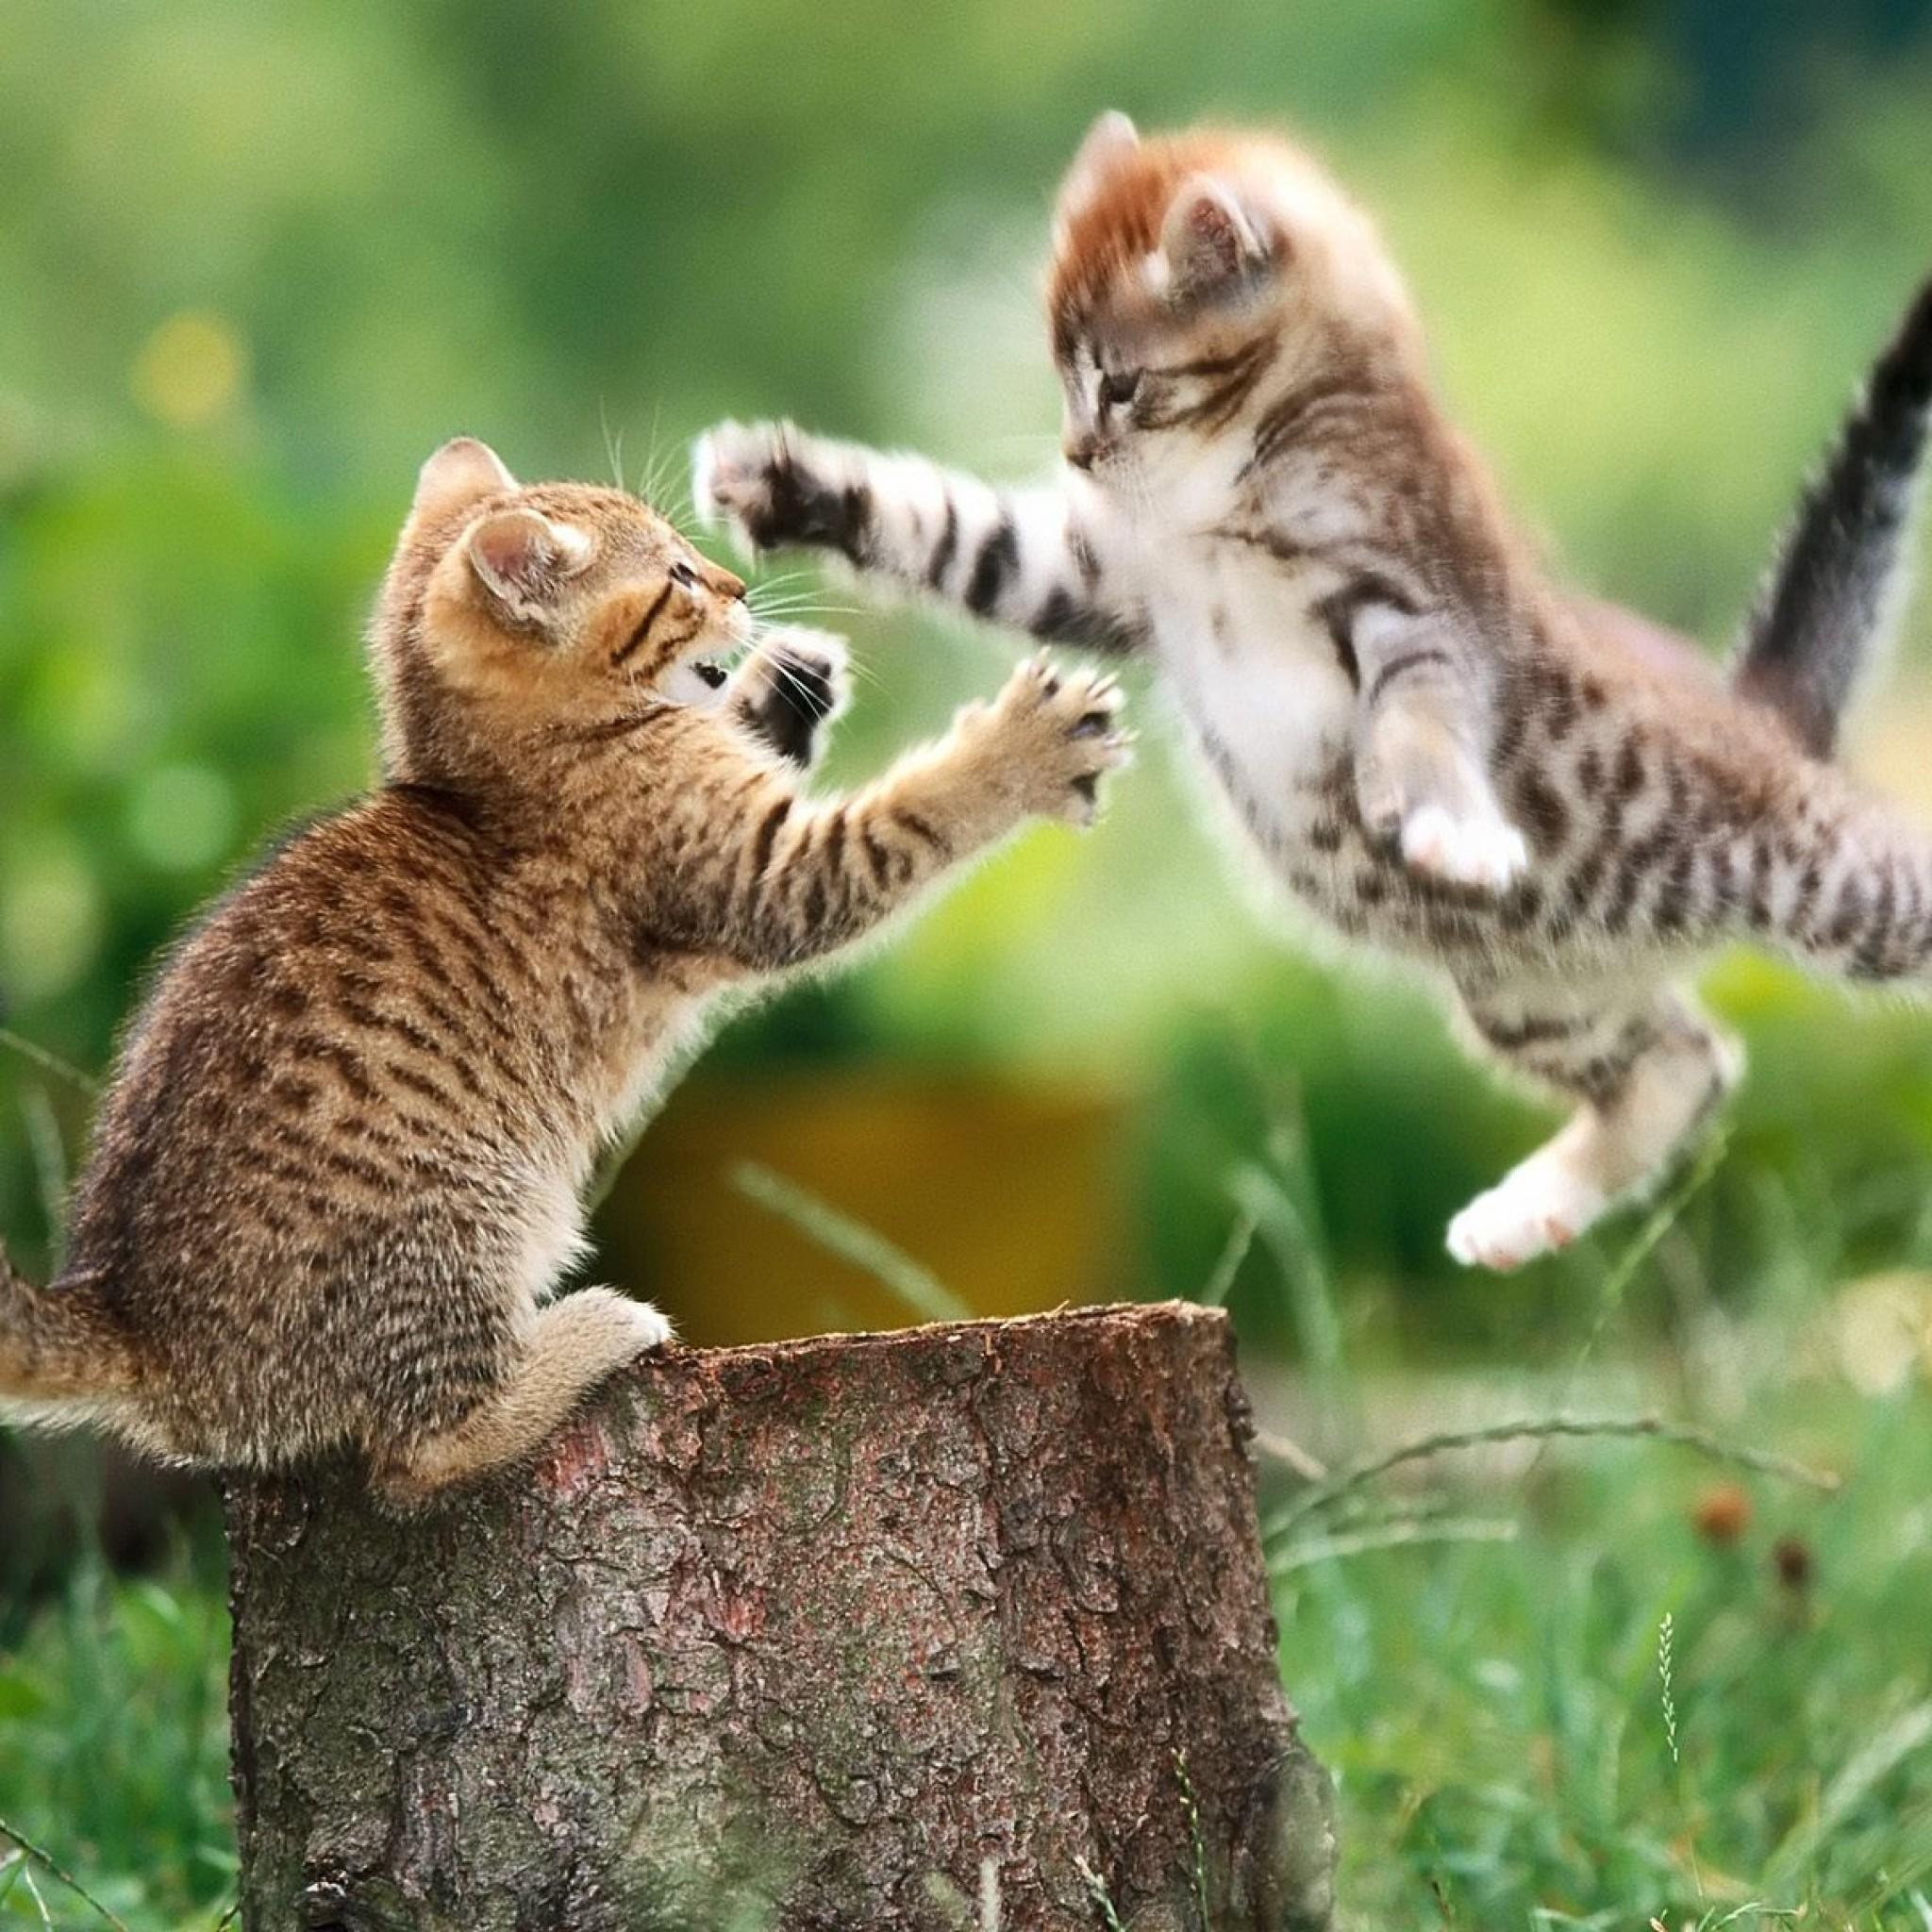 cats epic funny hd wallpaper HD Wallpapers 2048x2048